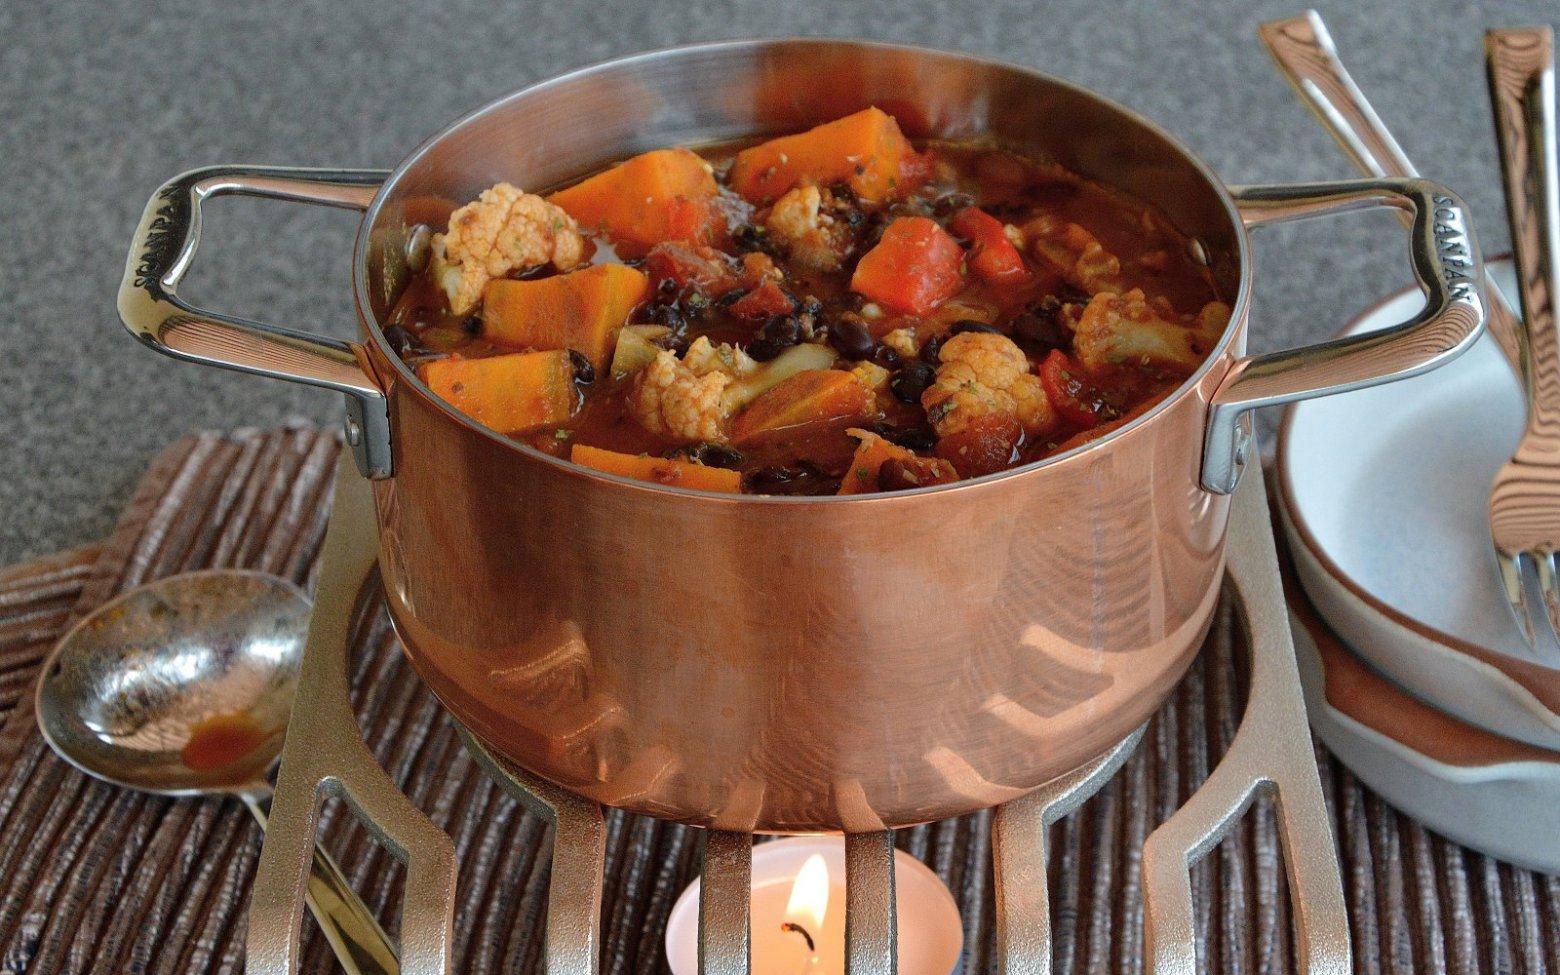 Vegan Black Bean, Cauliflower, and Sweet Potato Stew